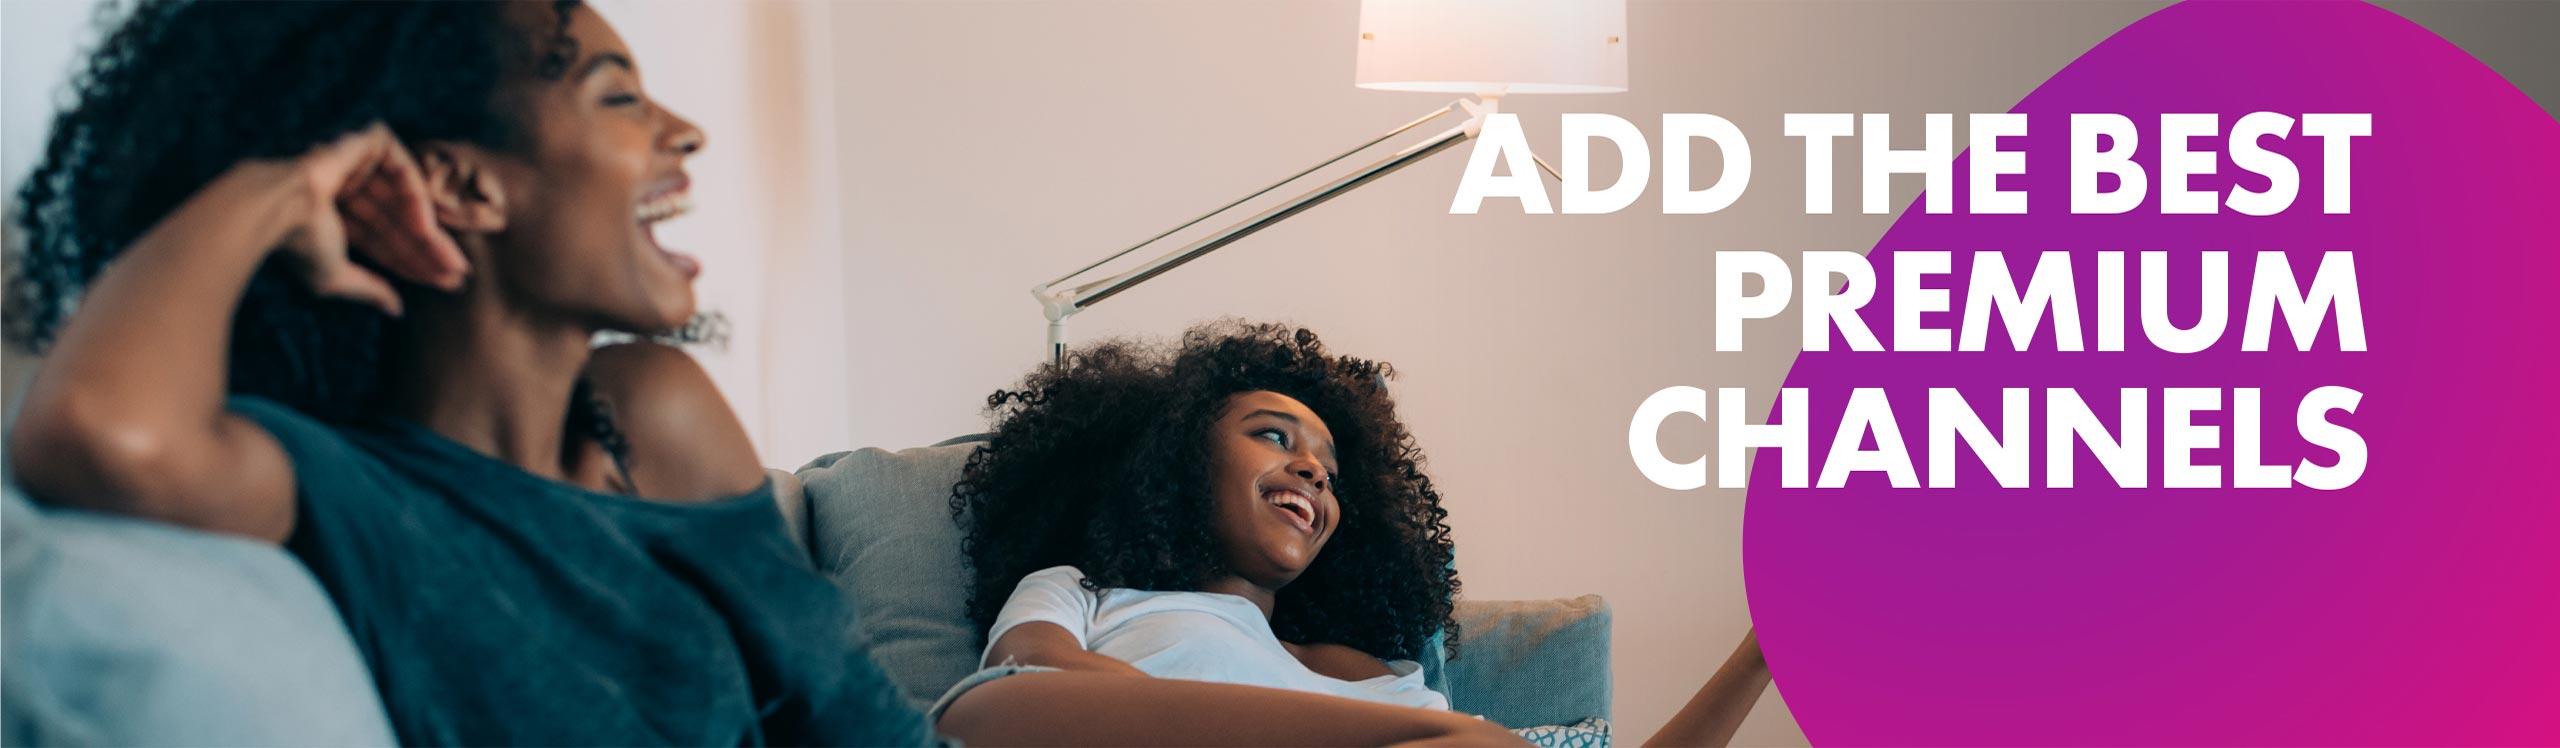 HBO-Addon-Desktop